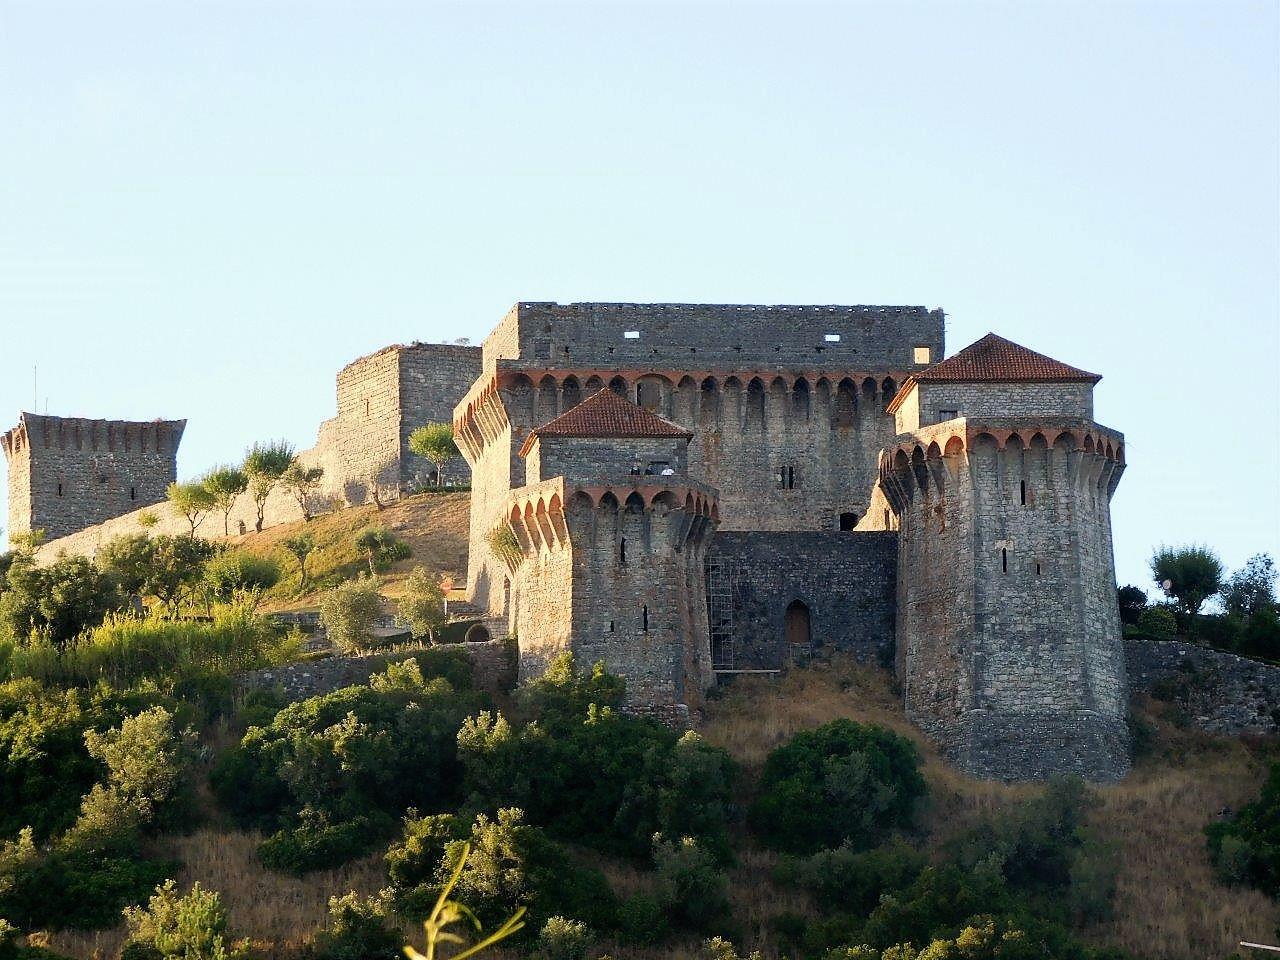 Sightseeing Visit Portugal - Ourém Templar